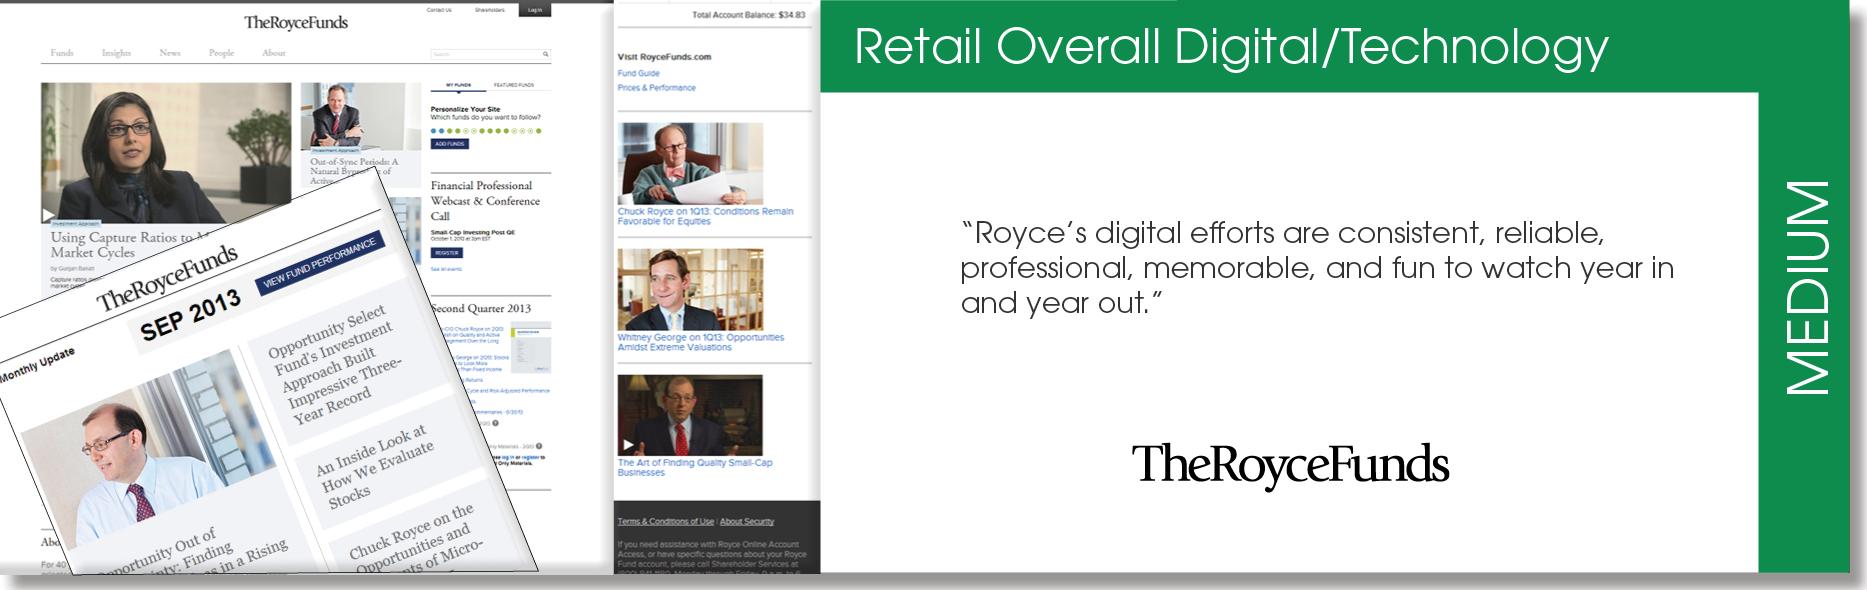 Medium Retail Winner Image13